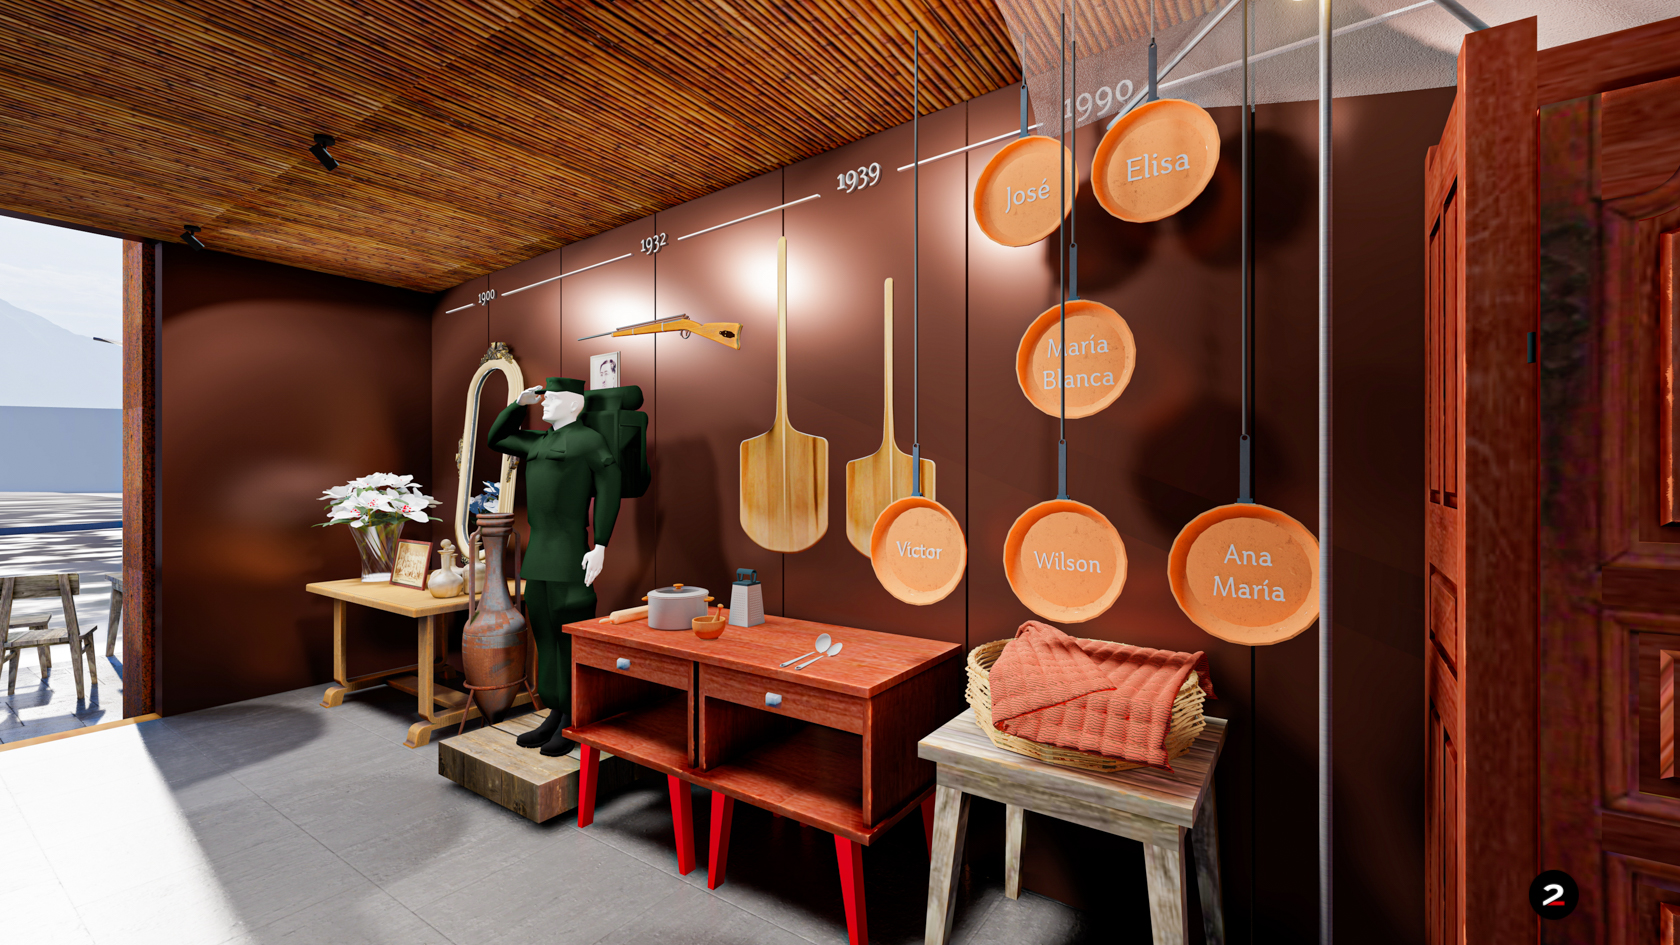 museoo wistupiku 2lineas